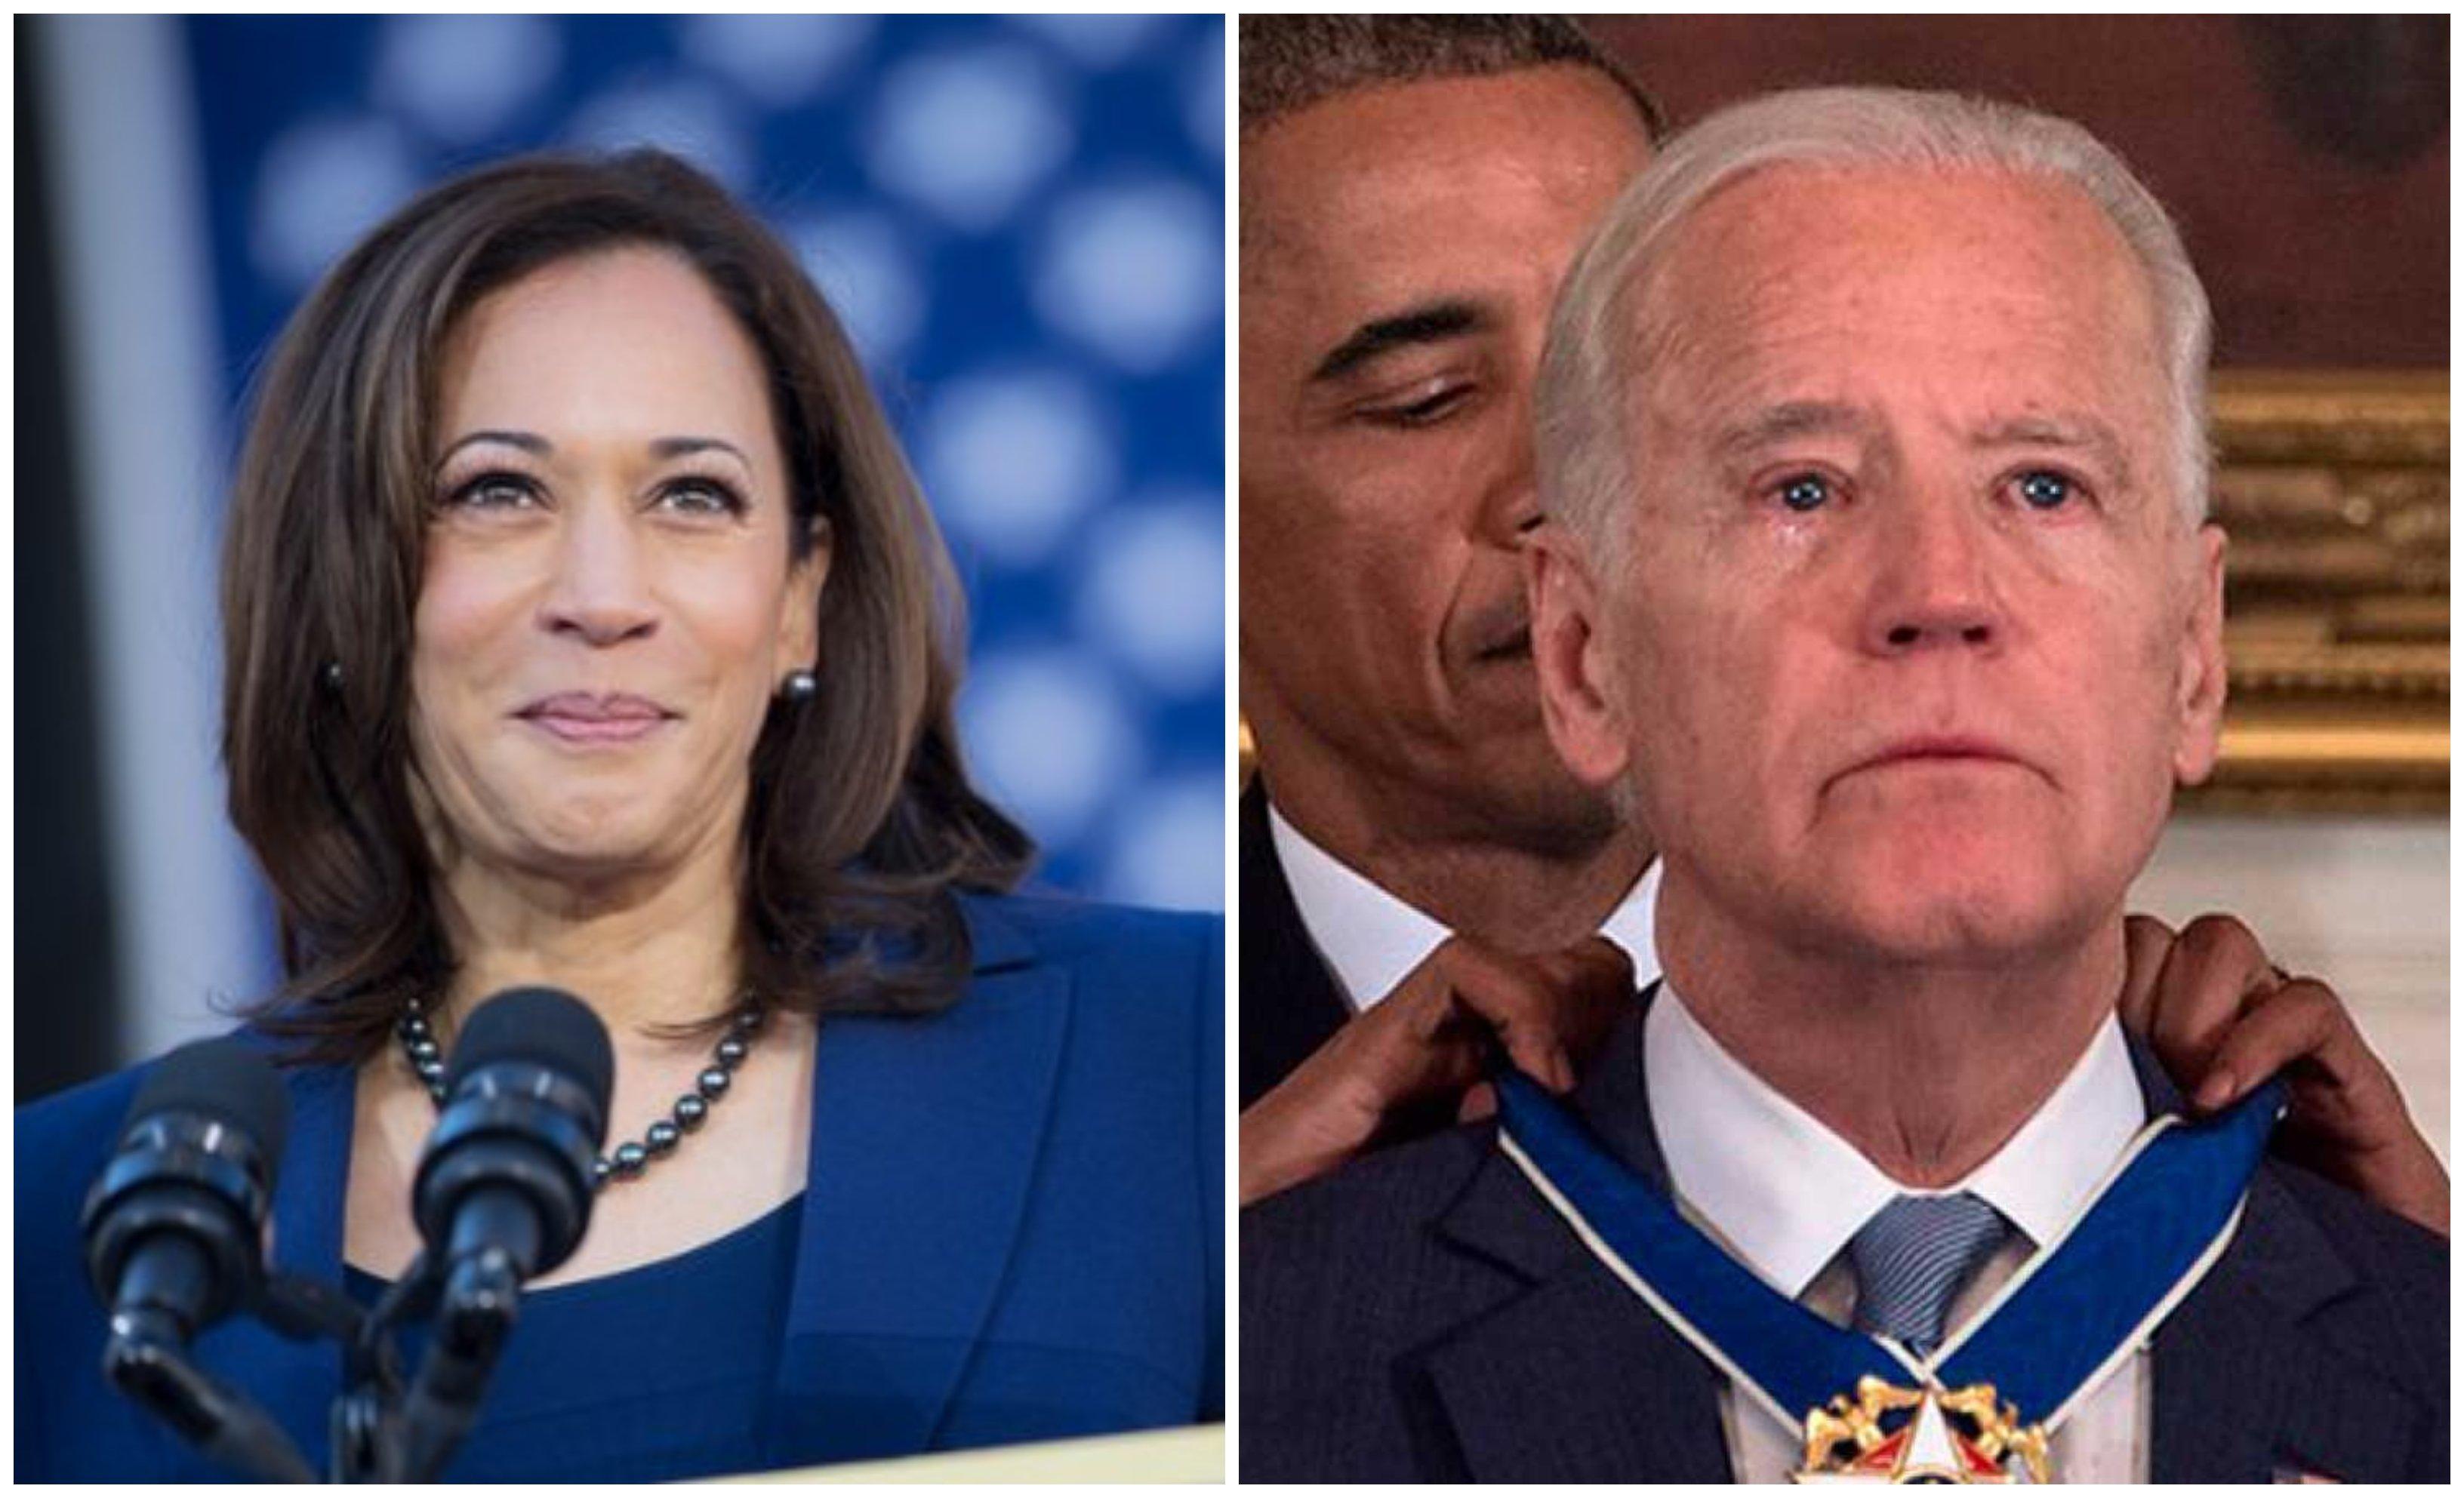 La senadora Kamala Harris, pro abortista y pro matrimonio gay, apoya a Joe Biden como candidato a pr